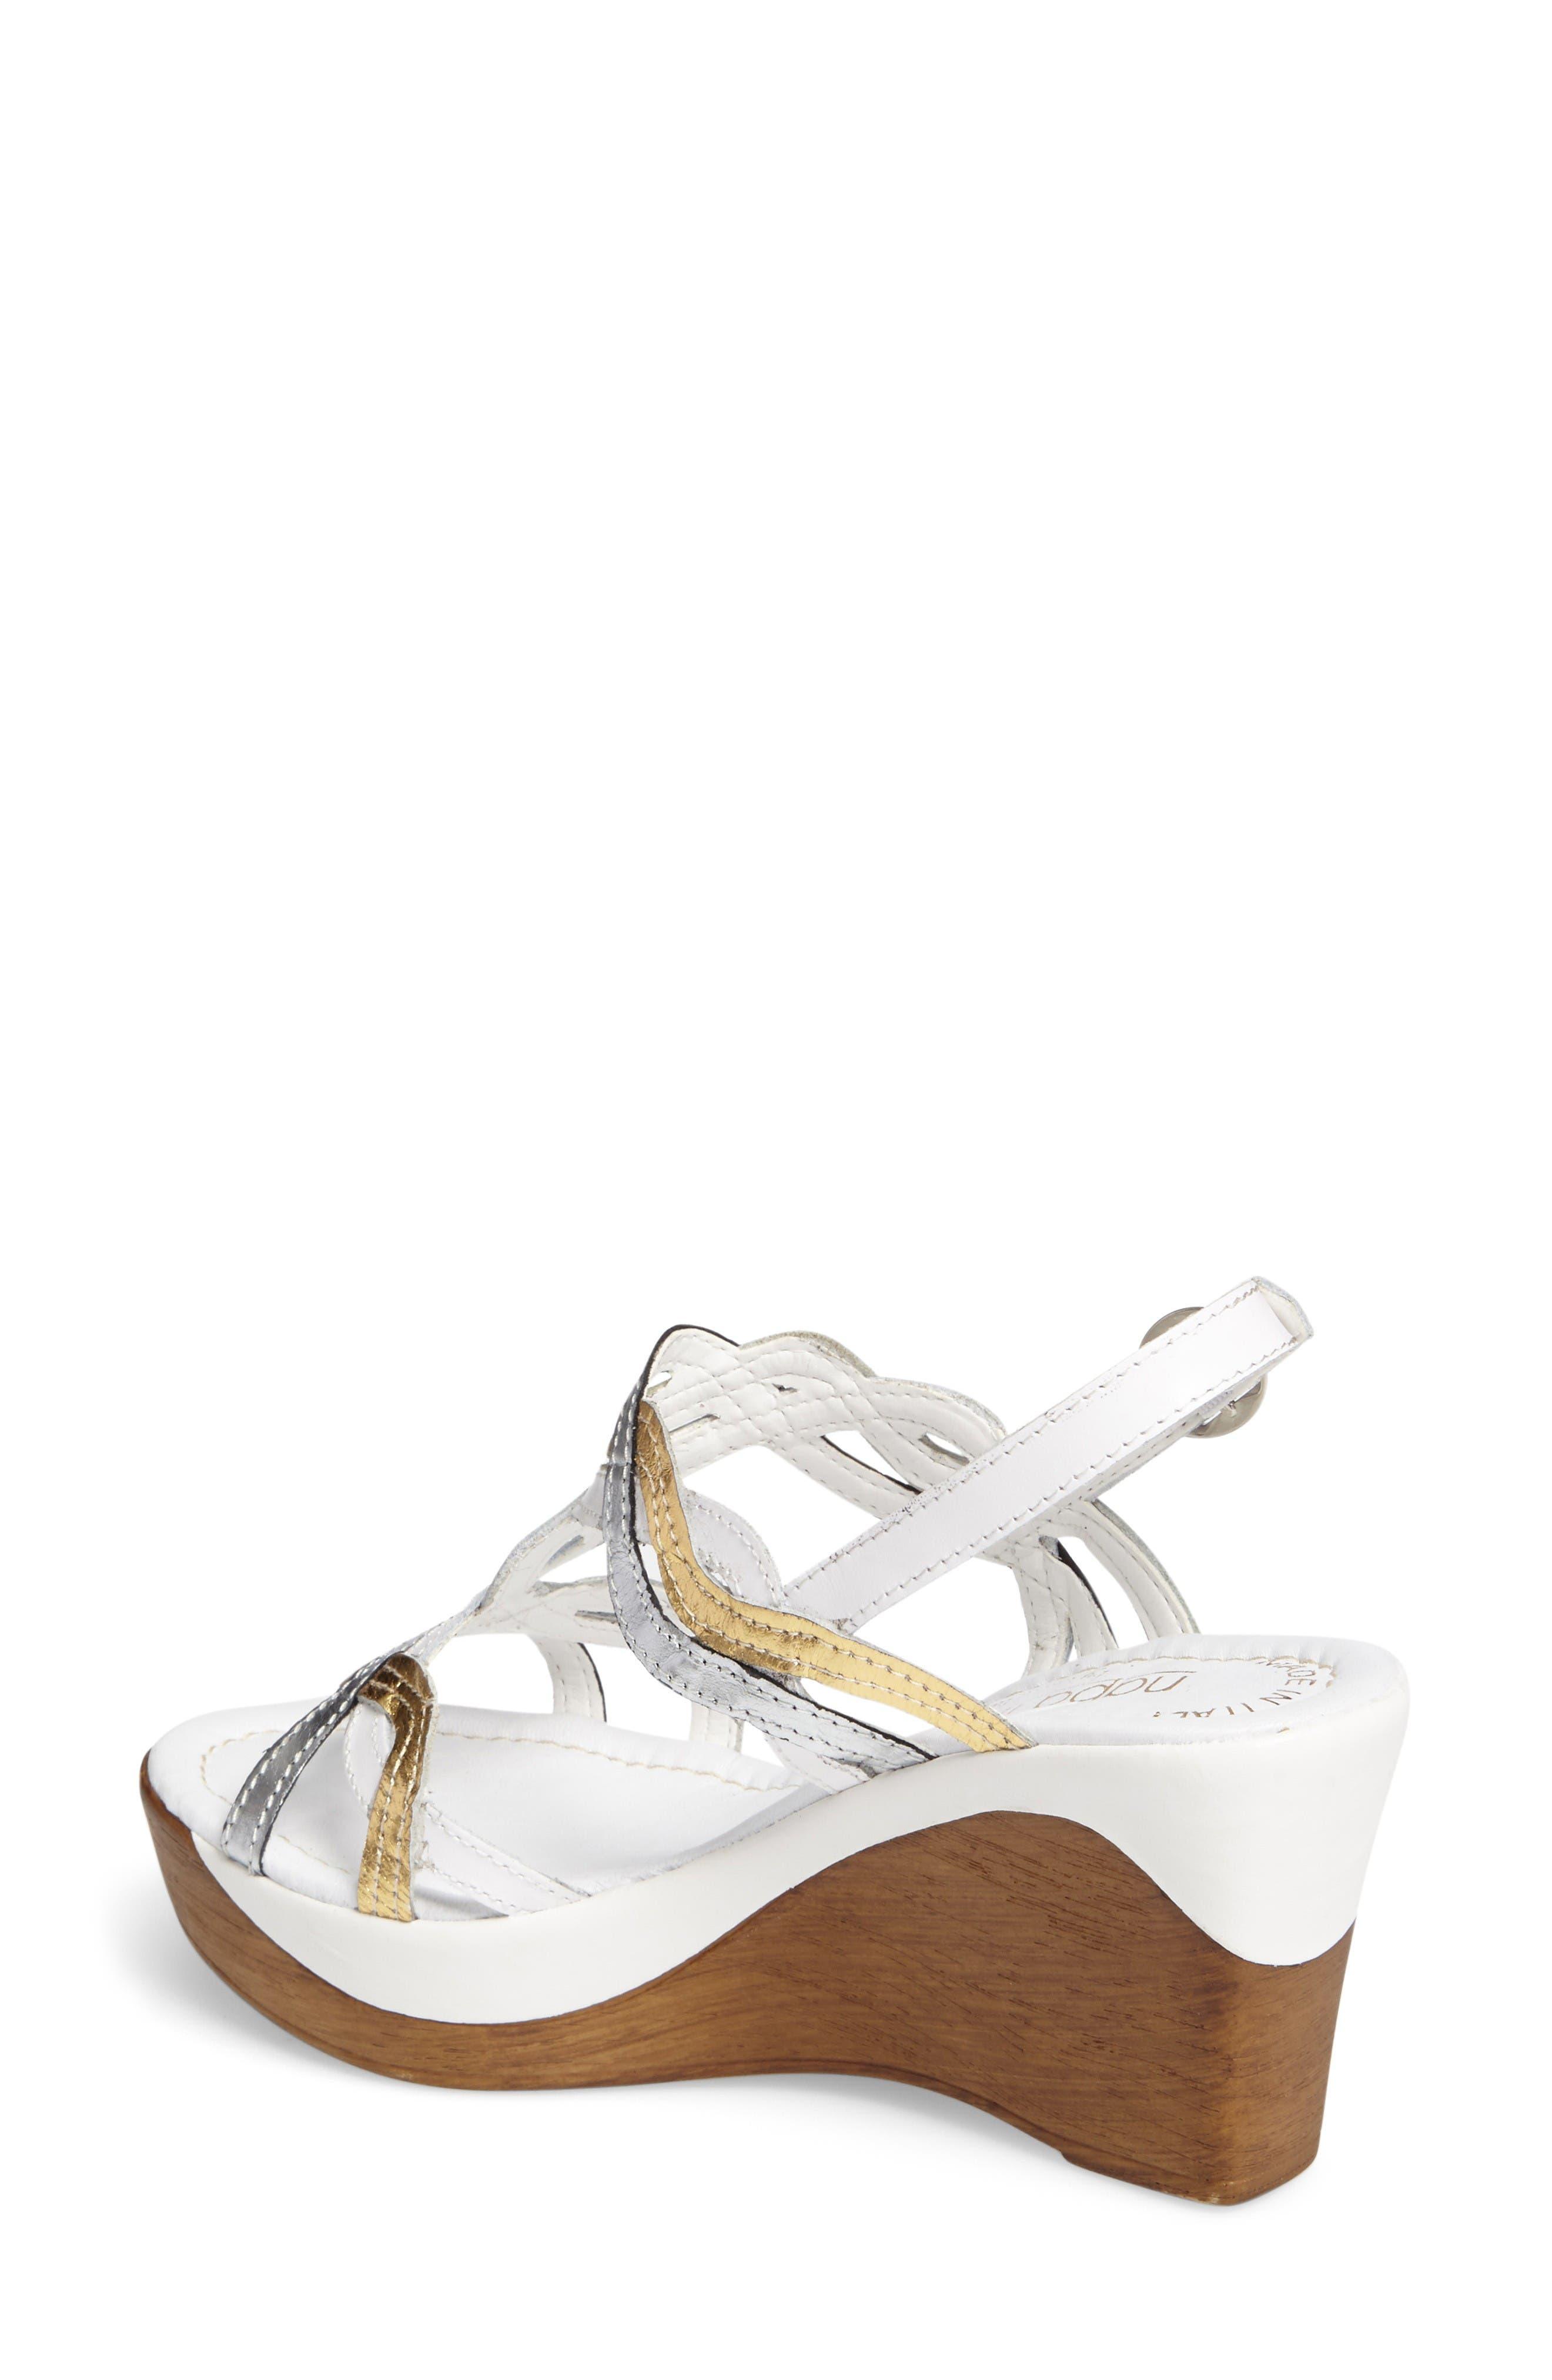 Alto Wedge Sandal,                             Alternate thumbnail 2, color,                             White Leather